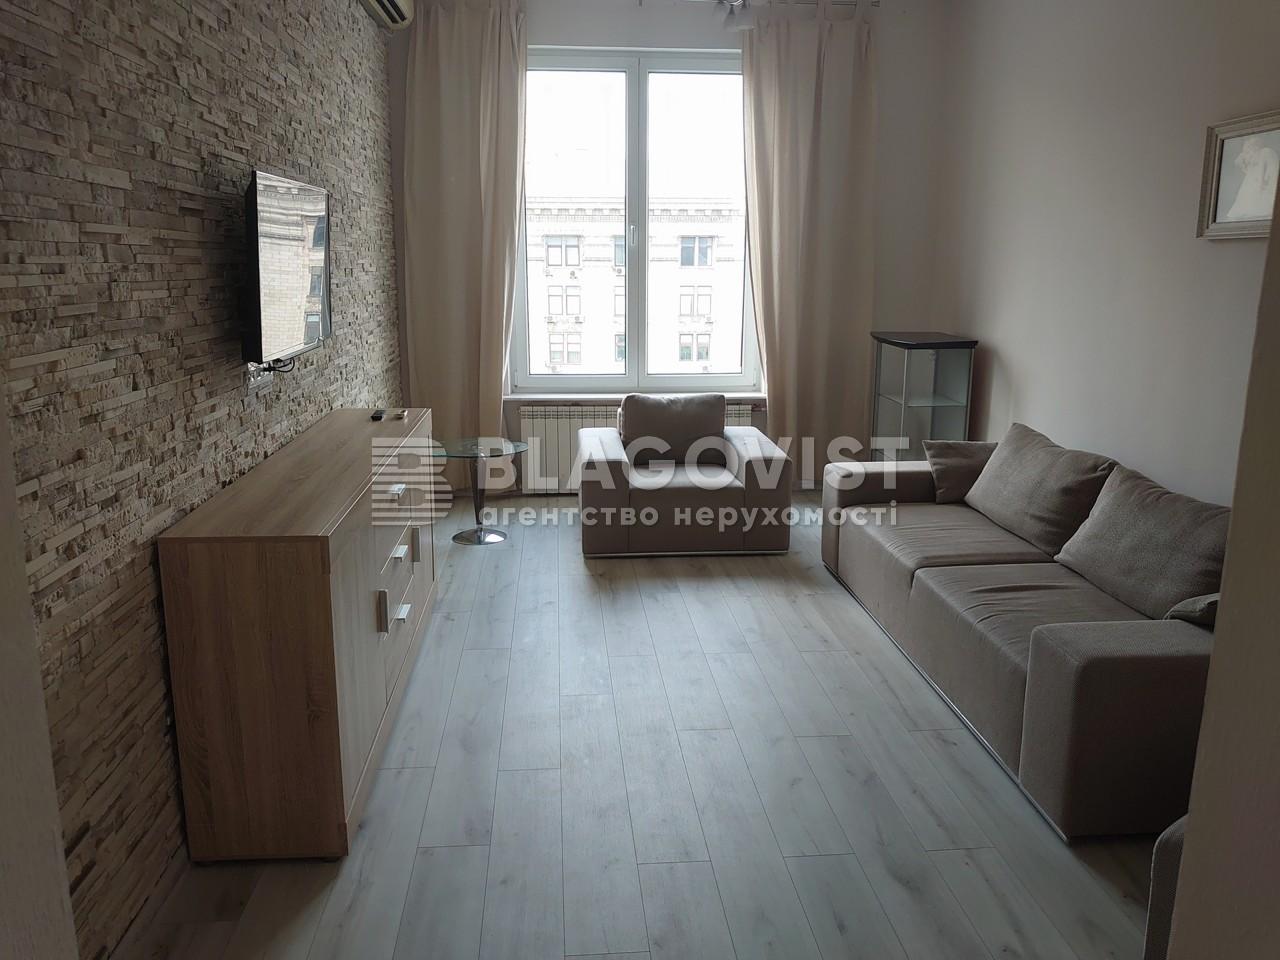 Квартира R-39925, Крещатик, 21, Киев - Фото 1